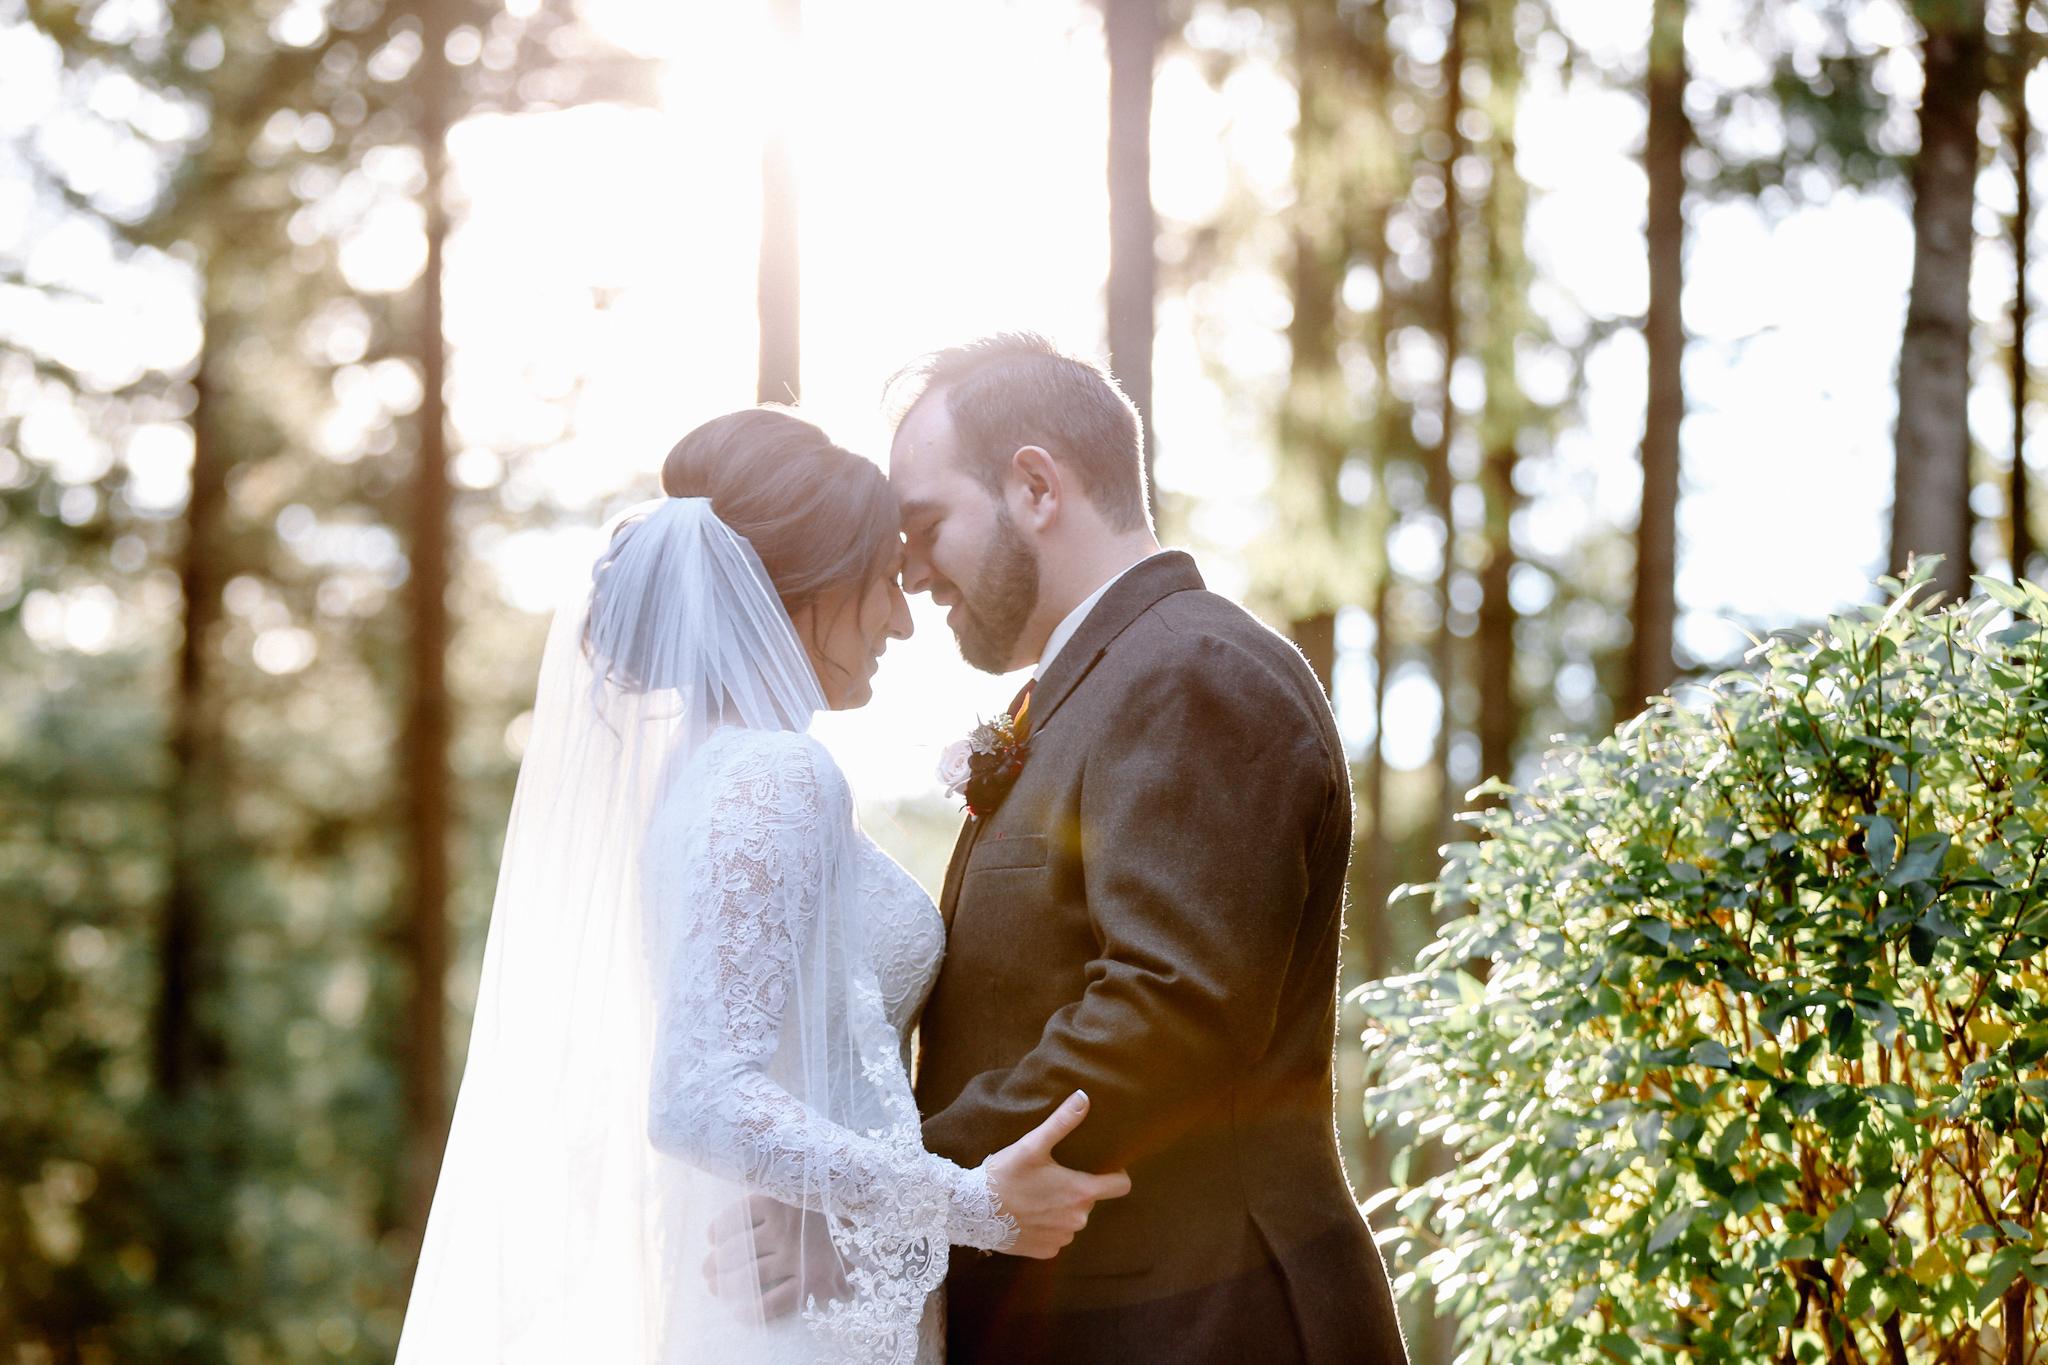 Manu and Laura - Portland Wedding Photographer - 23.jpg